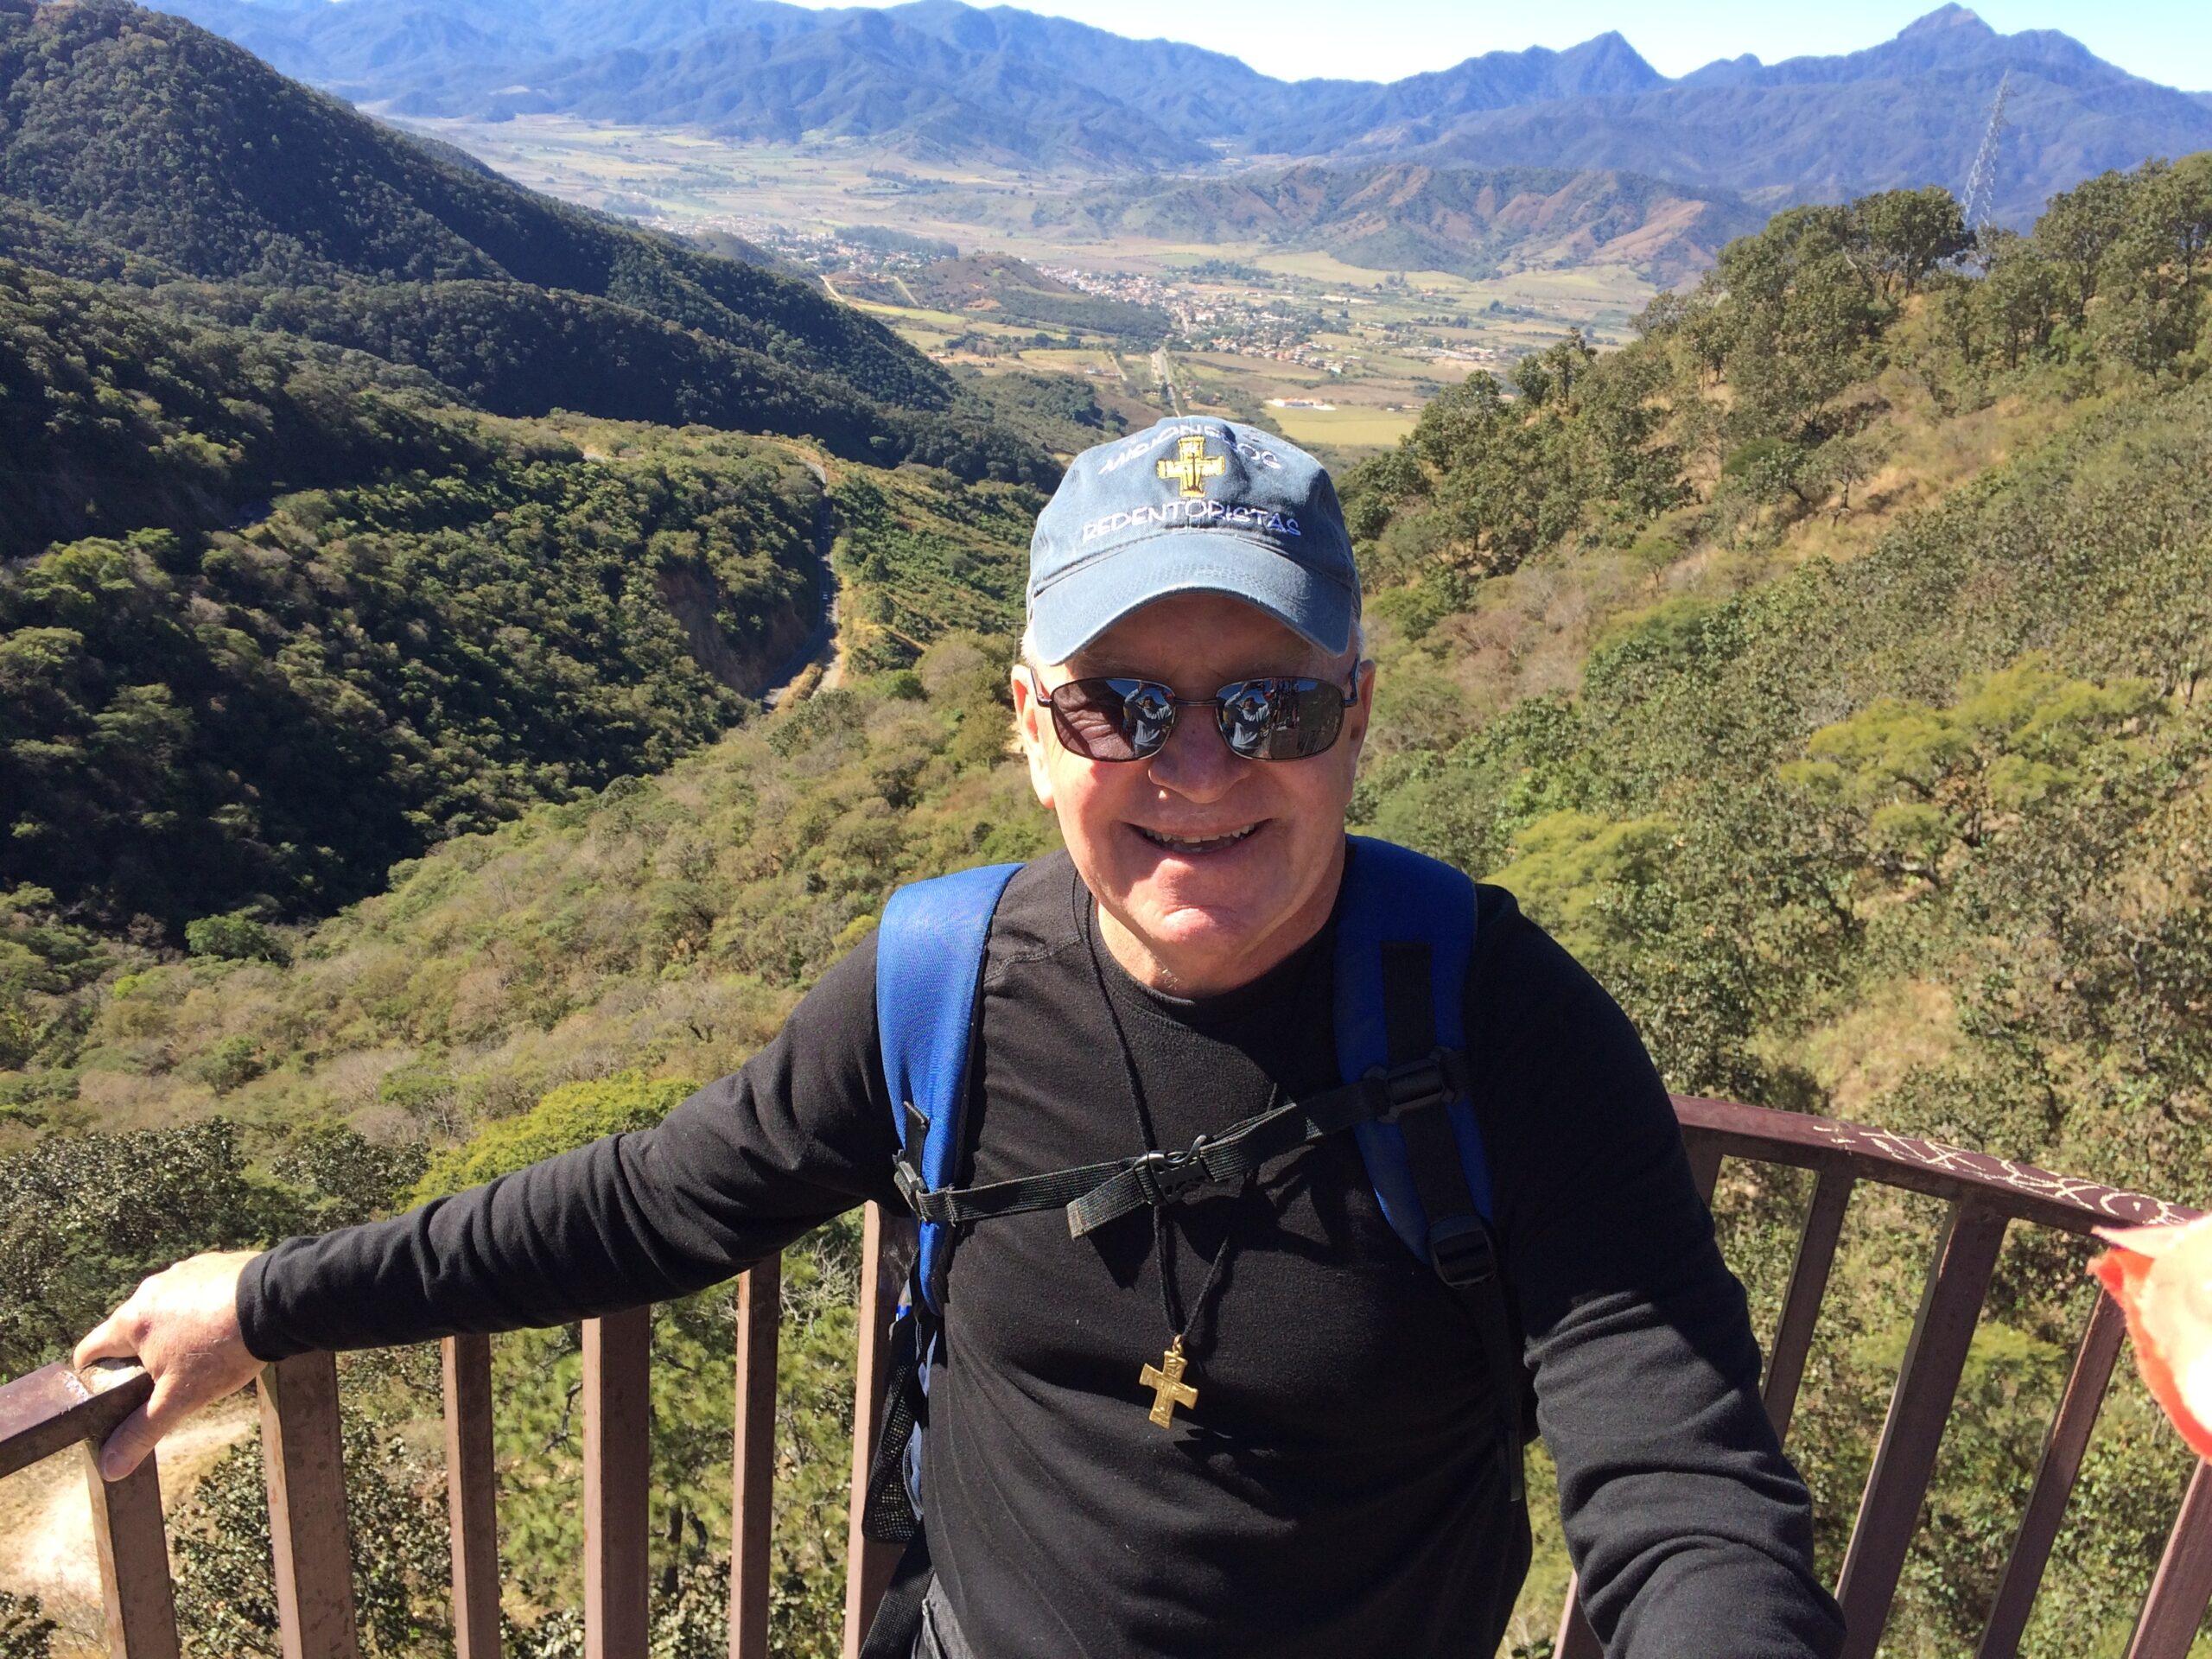 Virtual Pilgrimage 2021: Llegando en Talpa - Arriving in Talpa